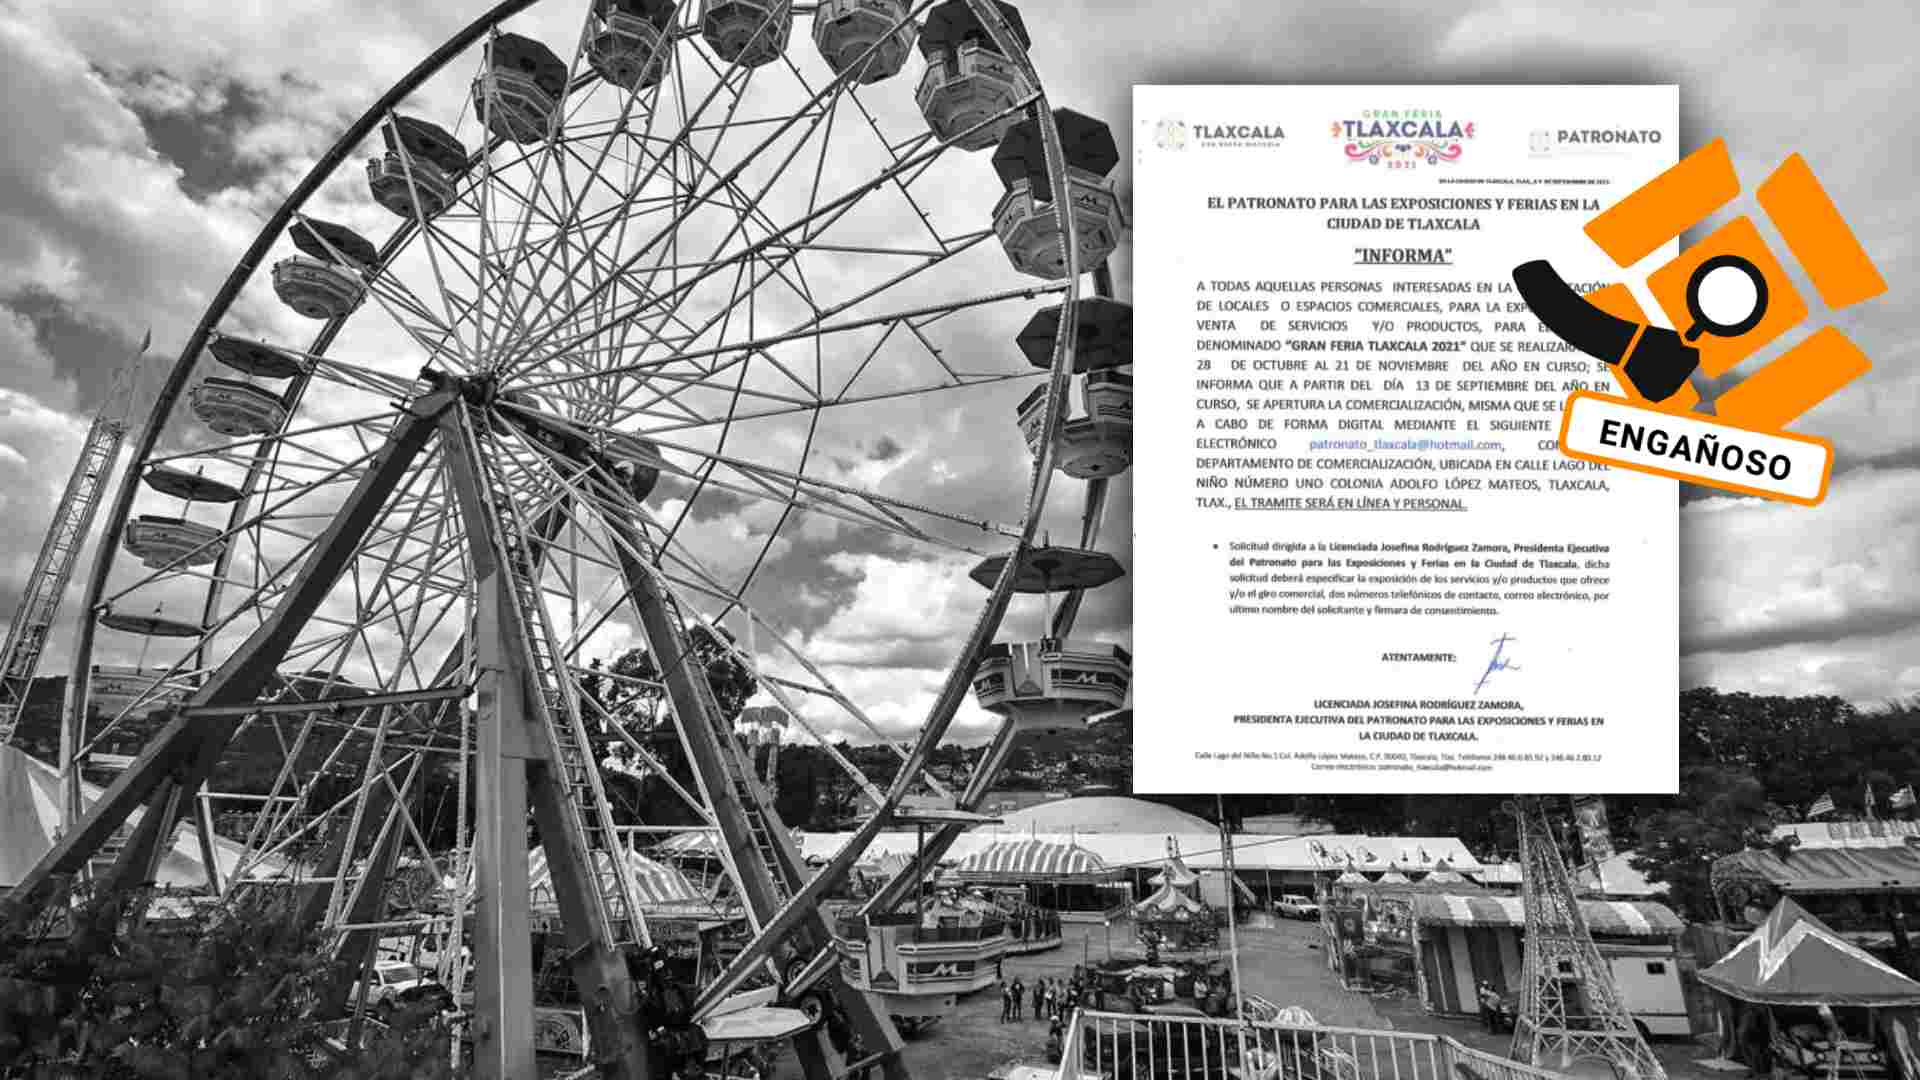 feria-tlaxcala-mexico-covid-2021